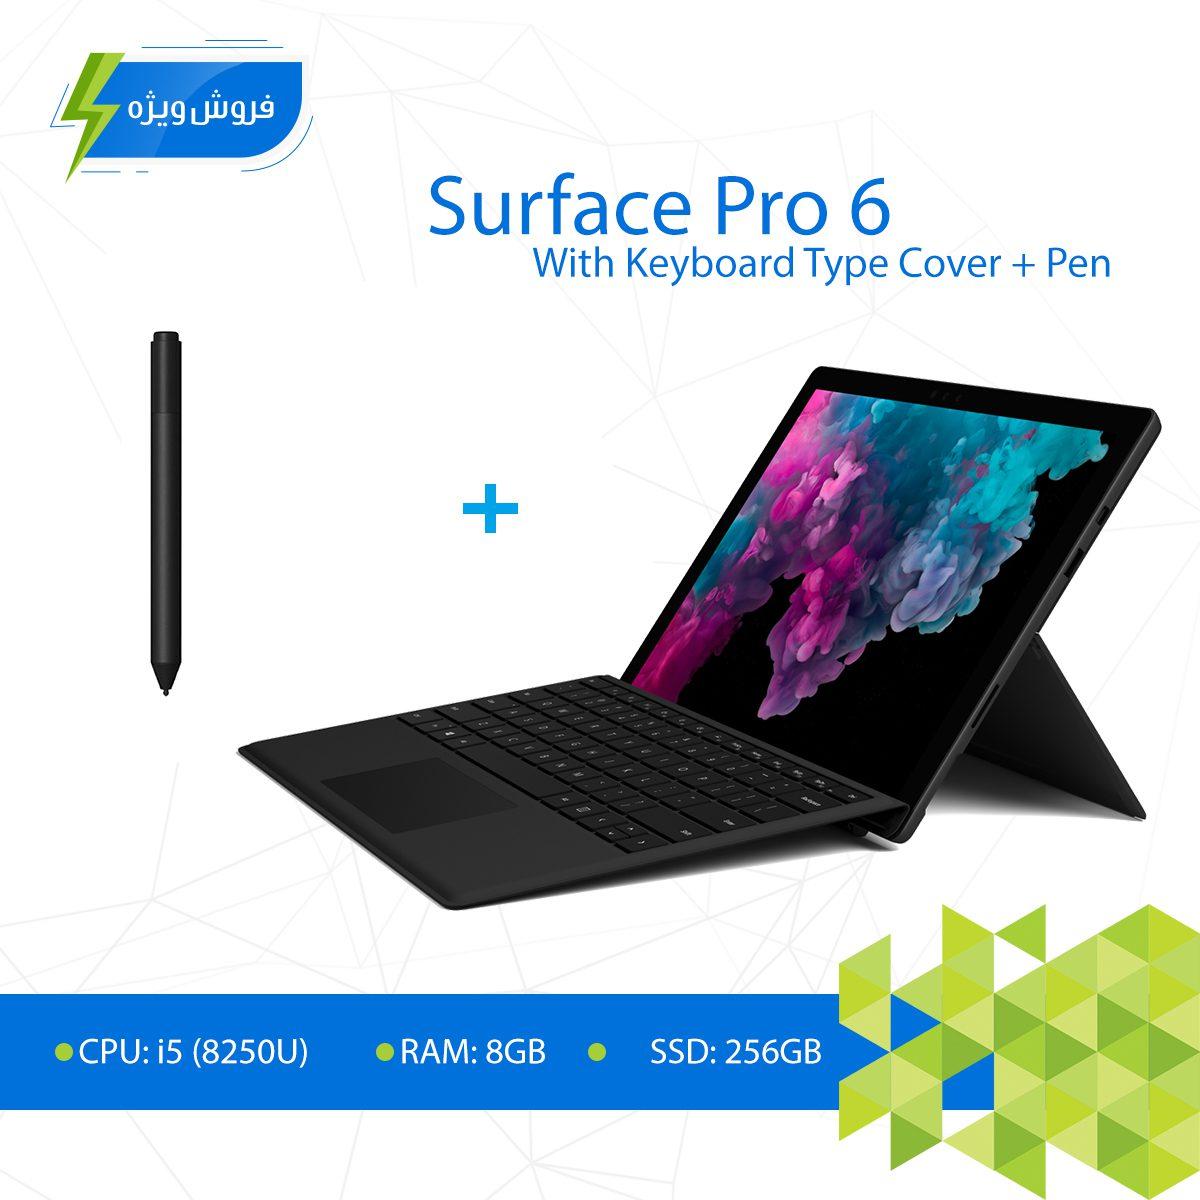 سرفیس پرو 6 مشکی/ i5 / 8GB / 256 SSD + کیبورد مشکی + قلم + کارت VIP